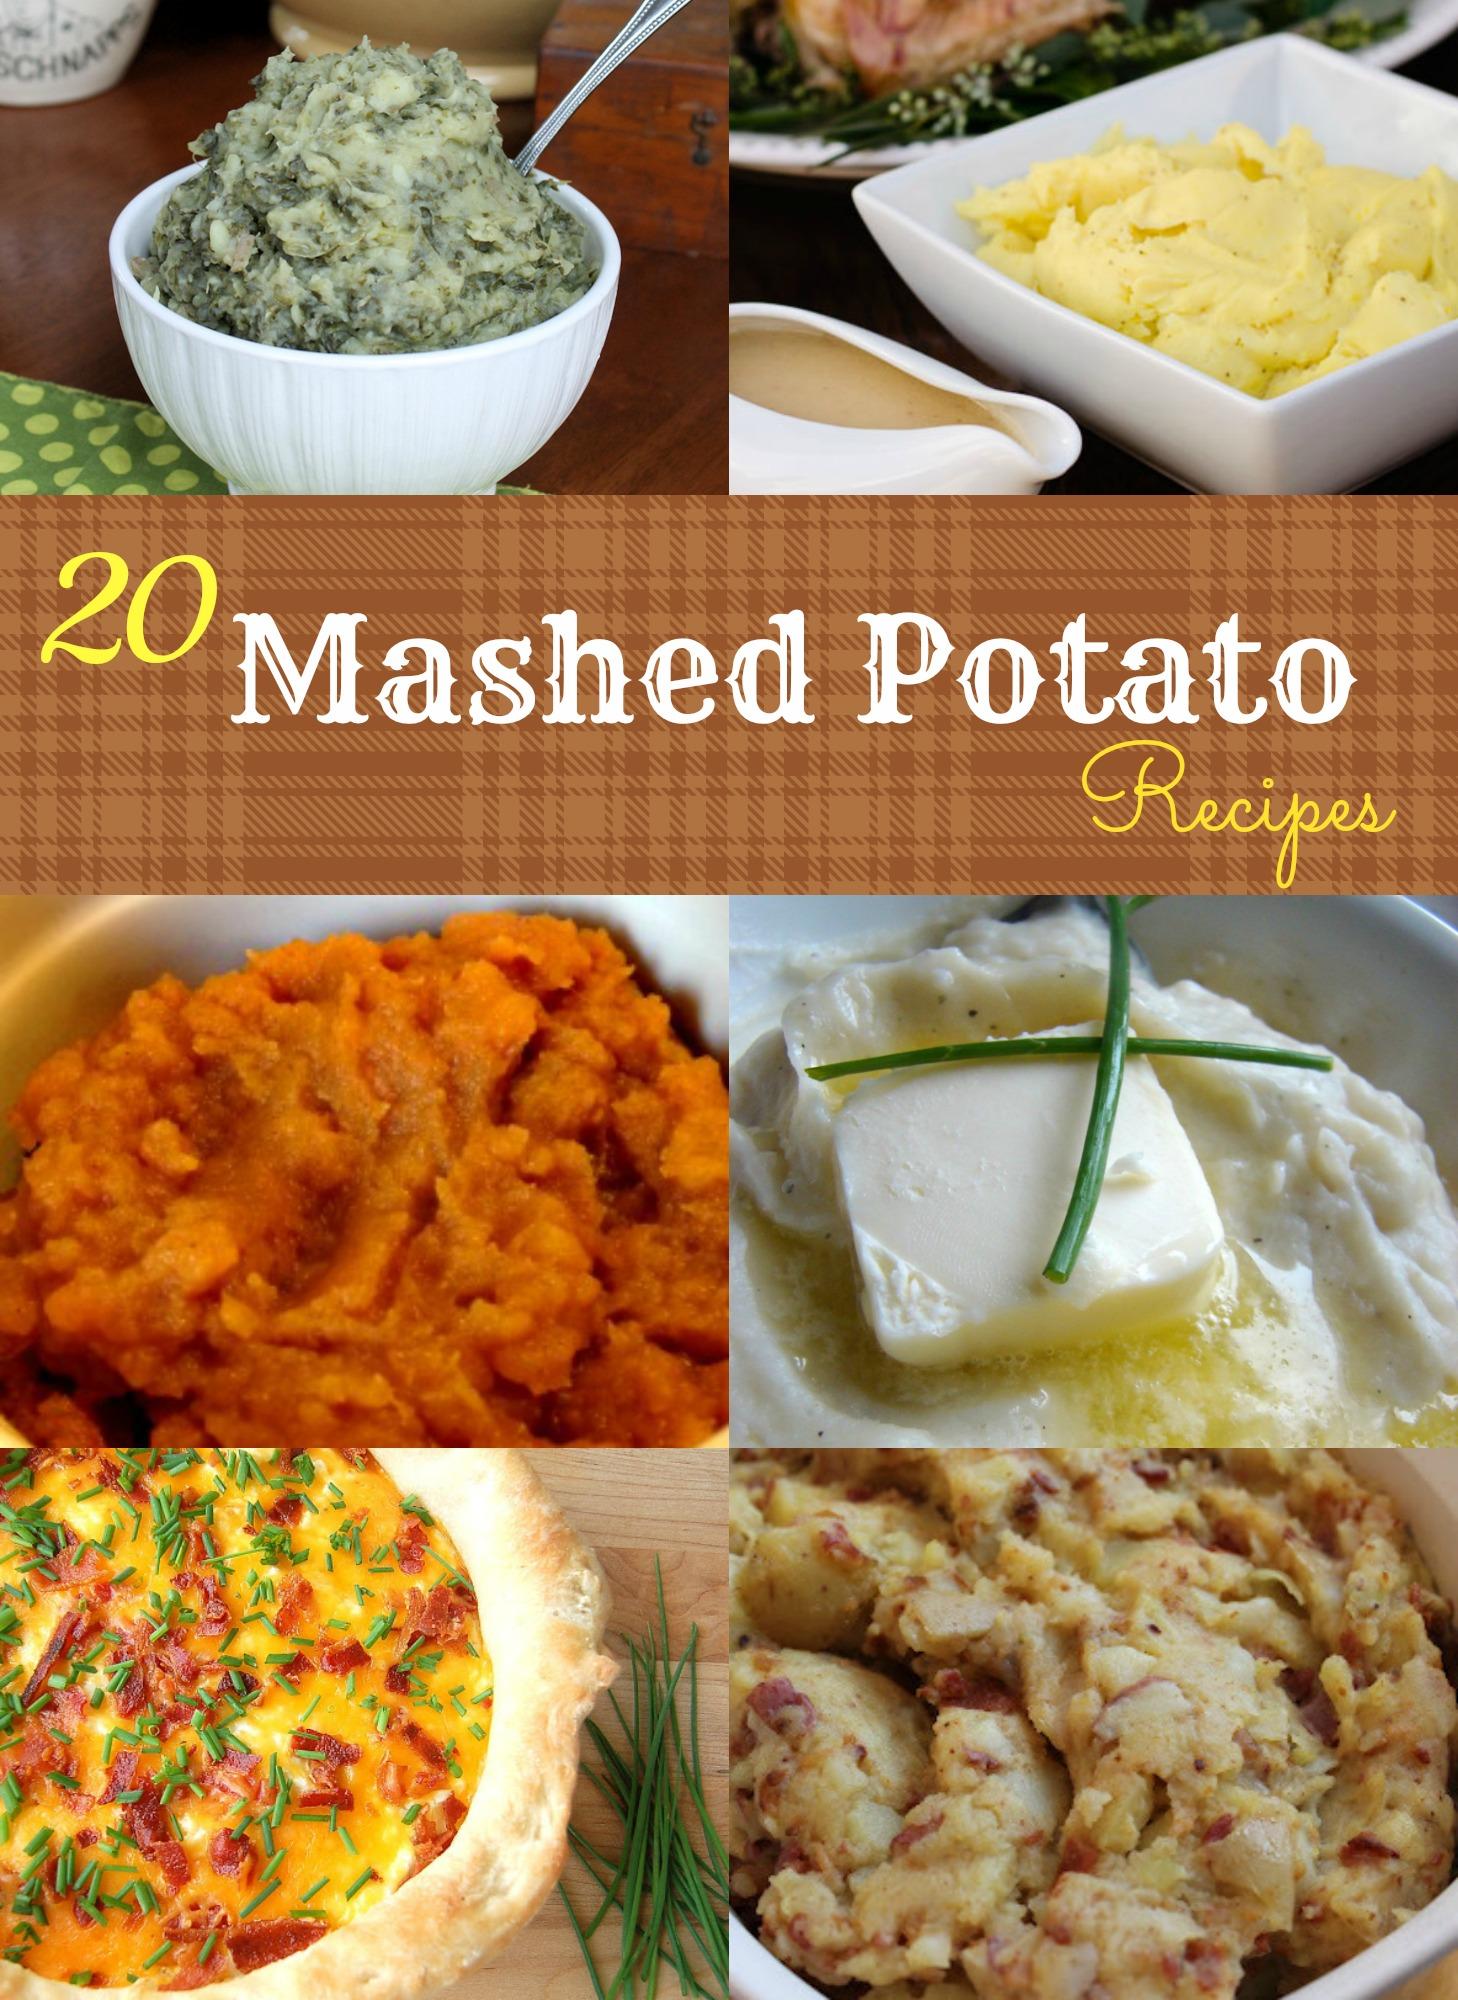 20 Mashed Potato Recipes